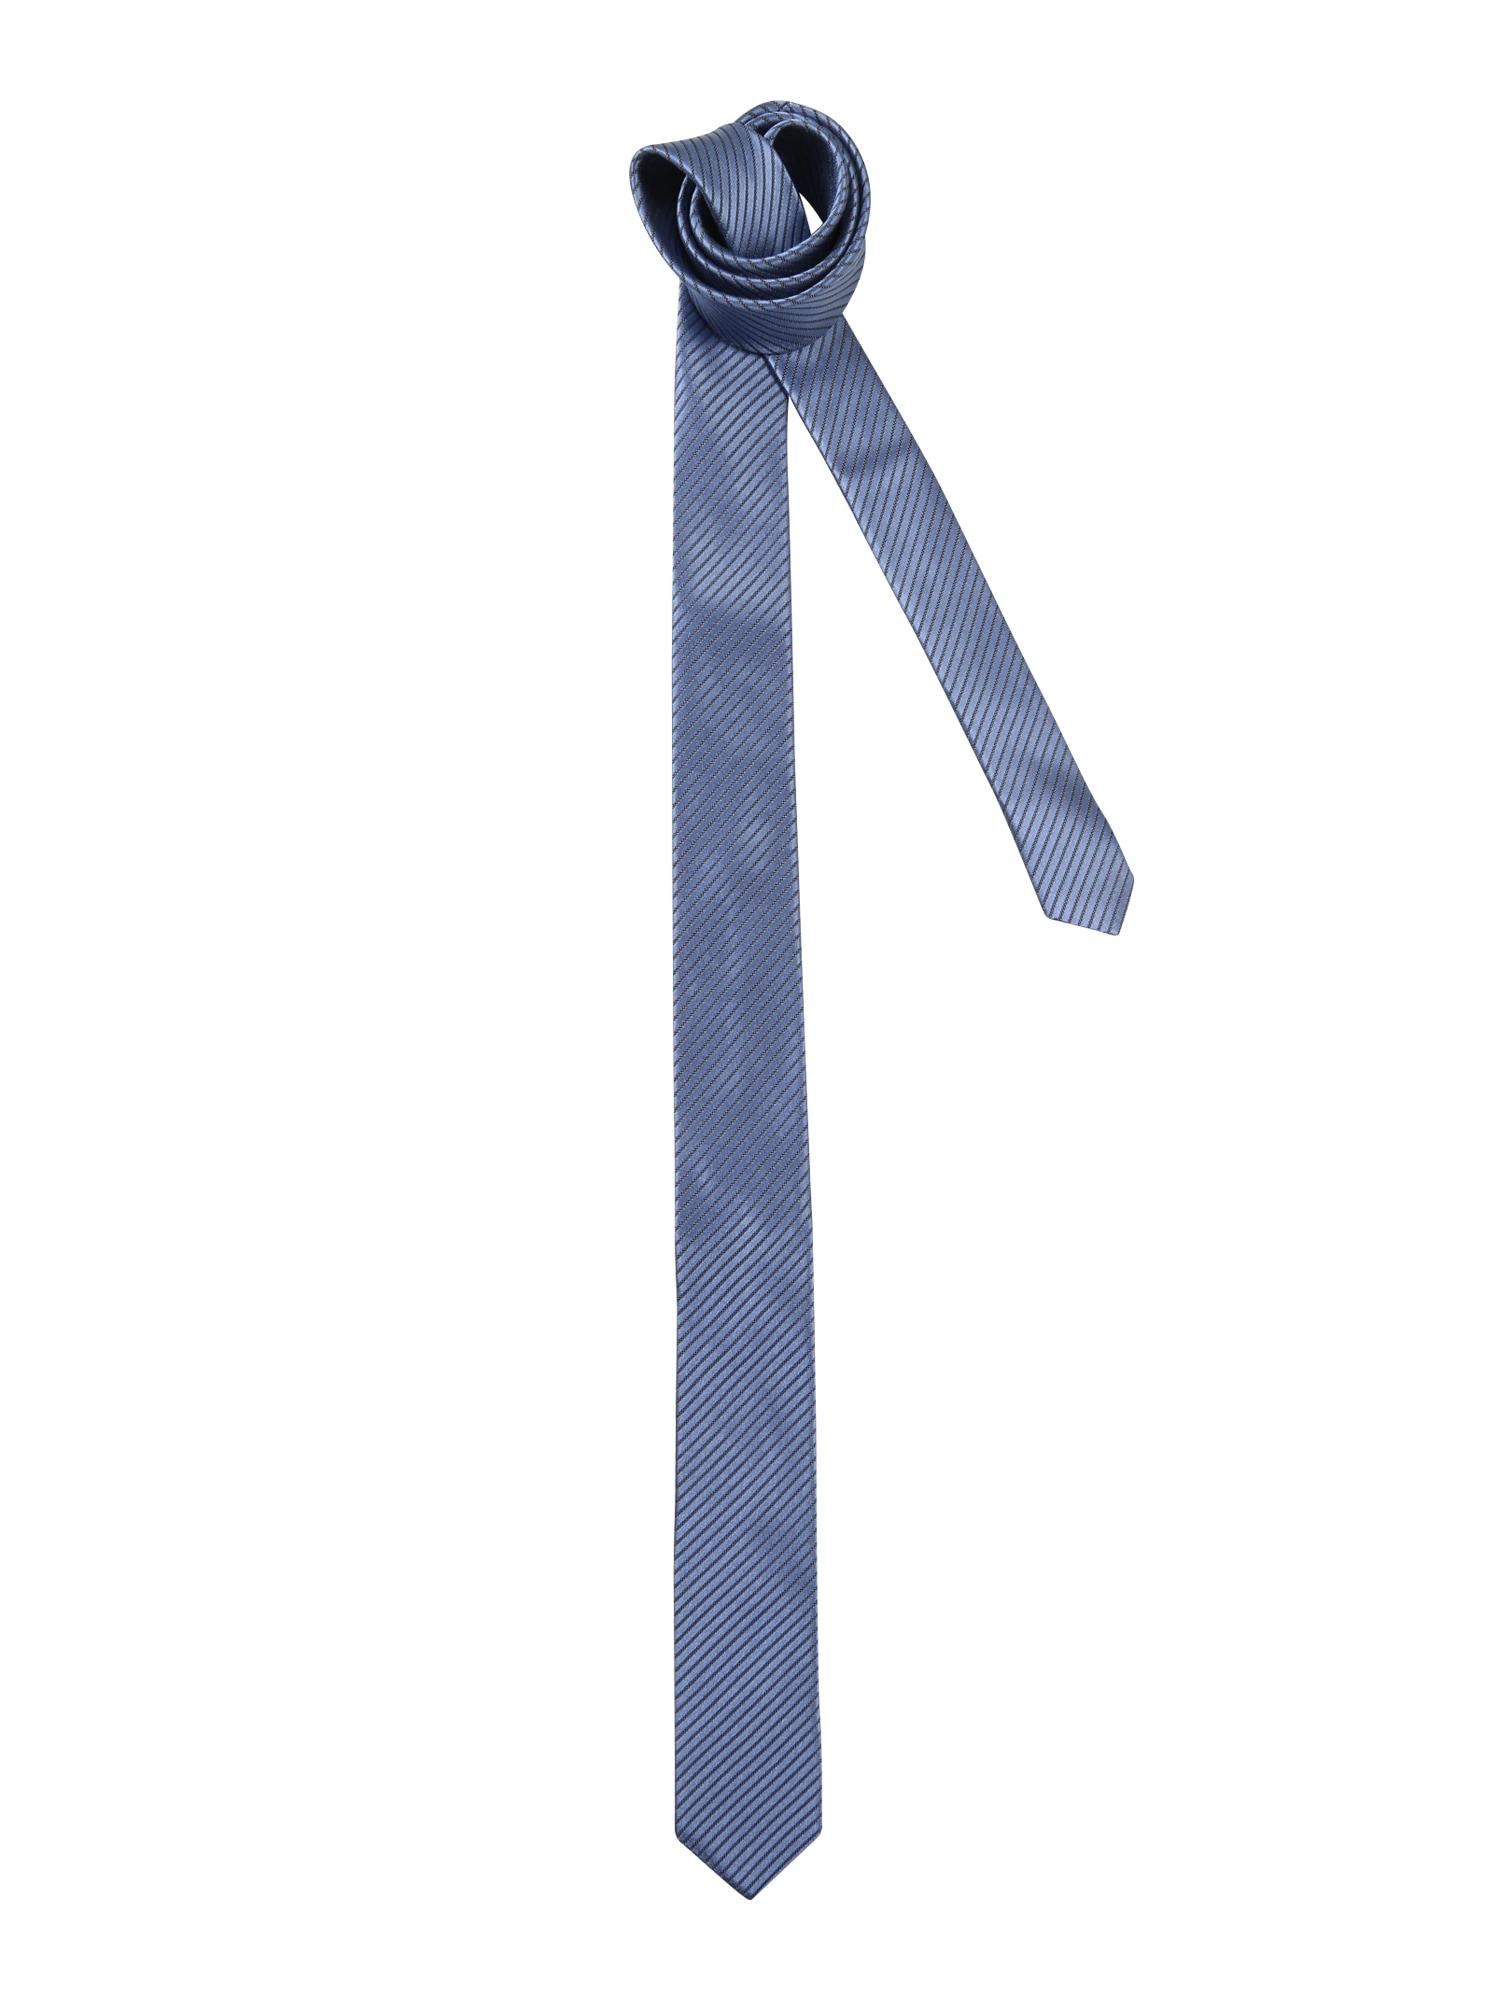 Kravata TIE SLIM modrá DRYKORN